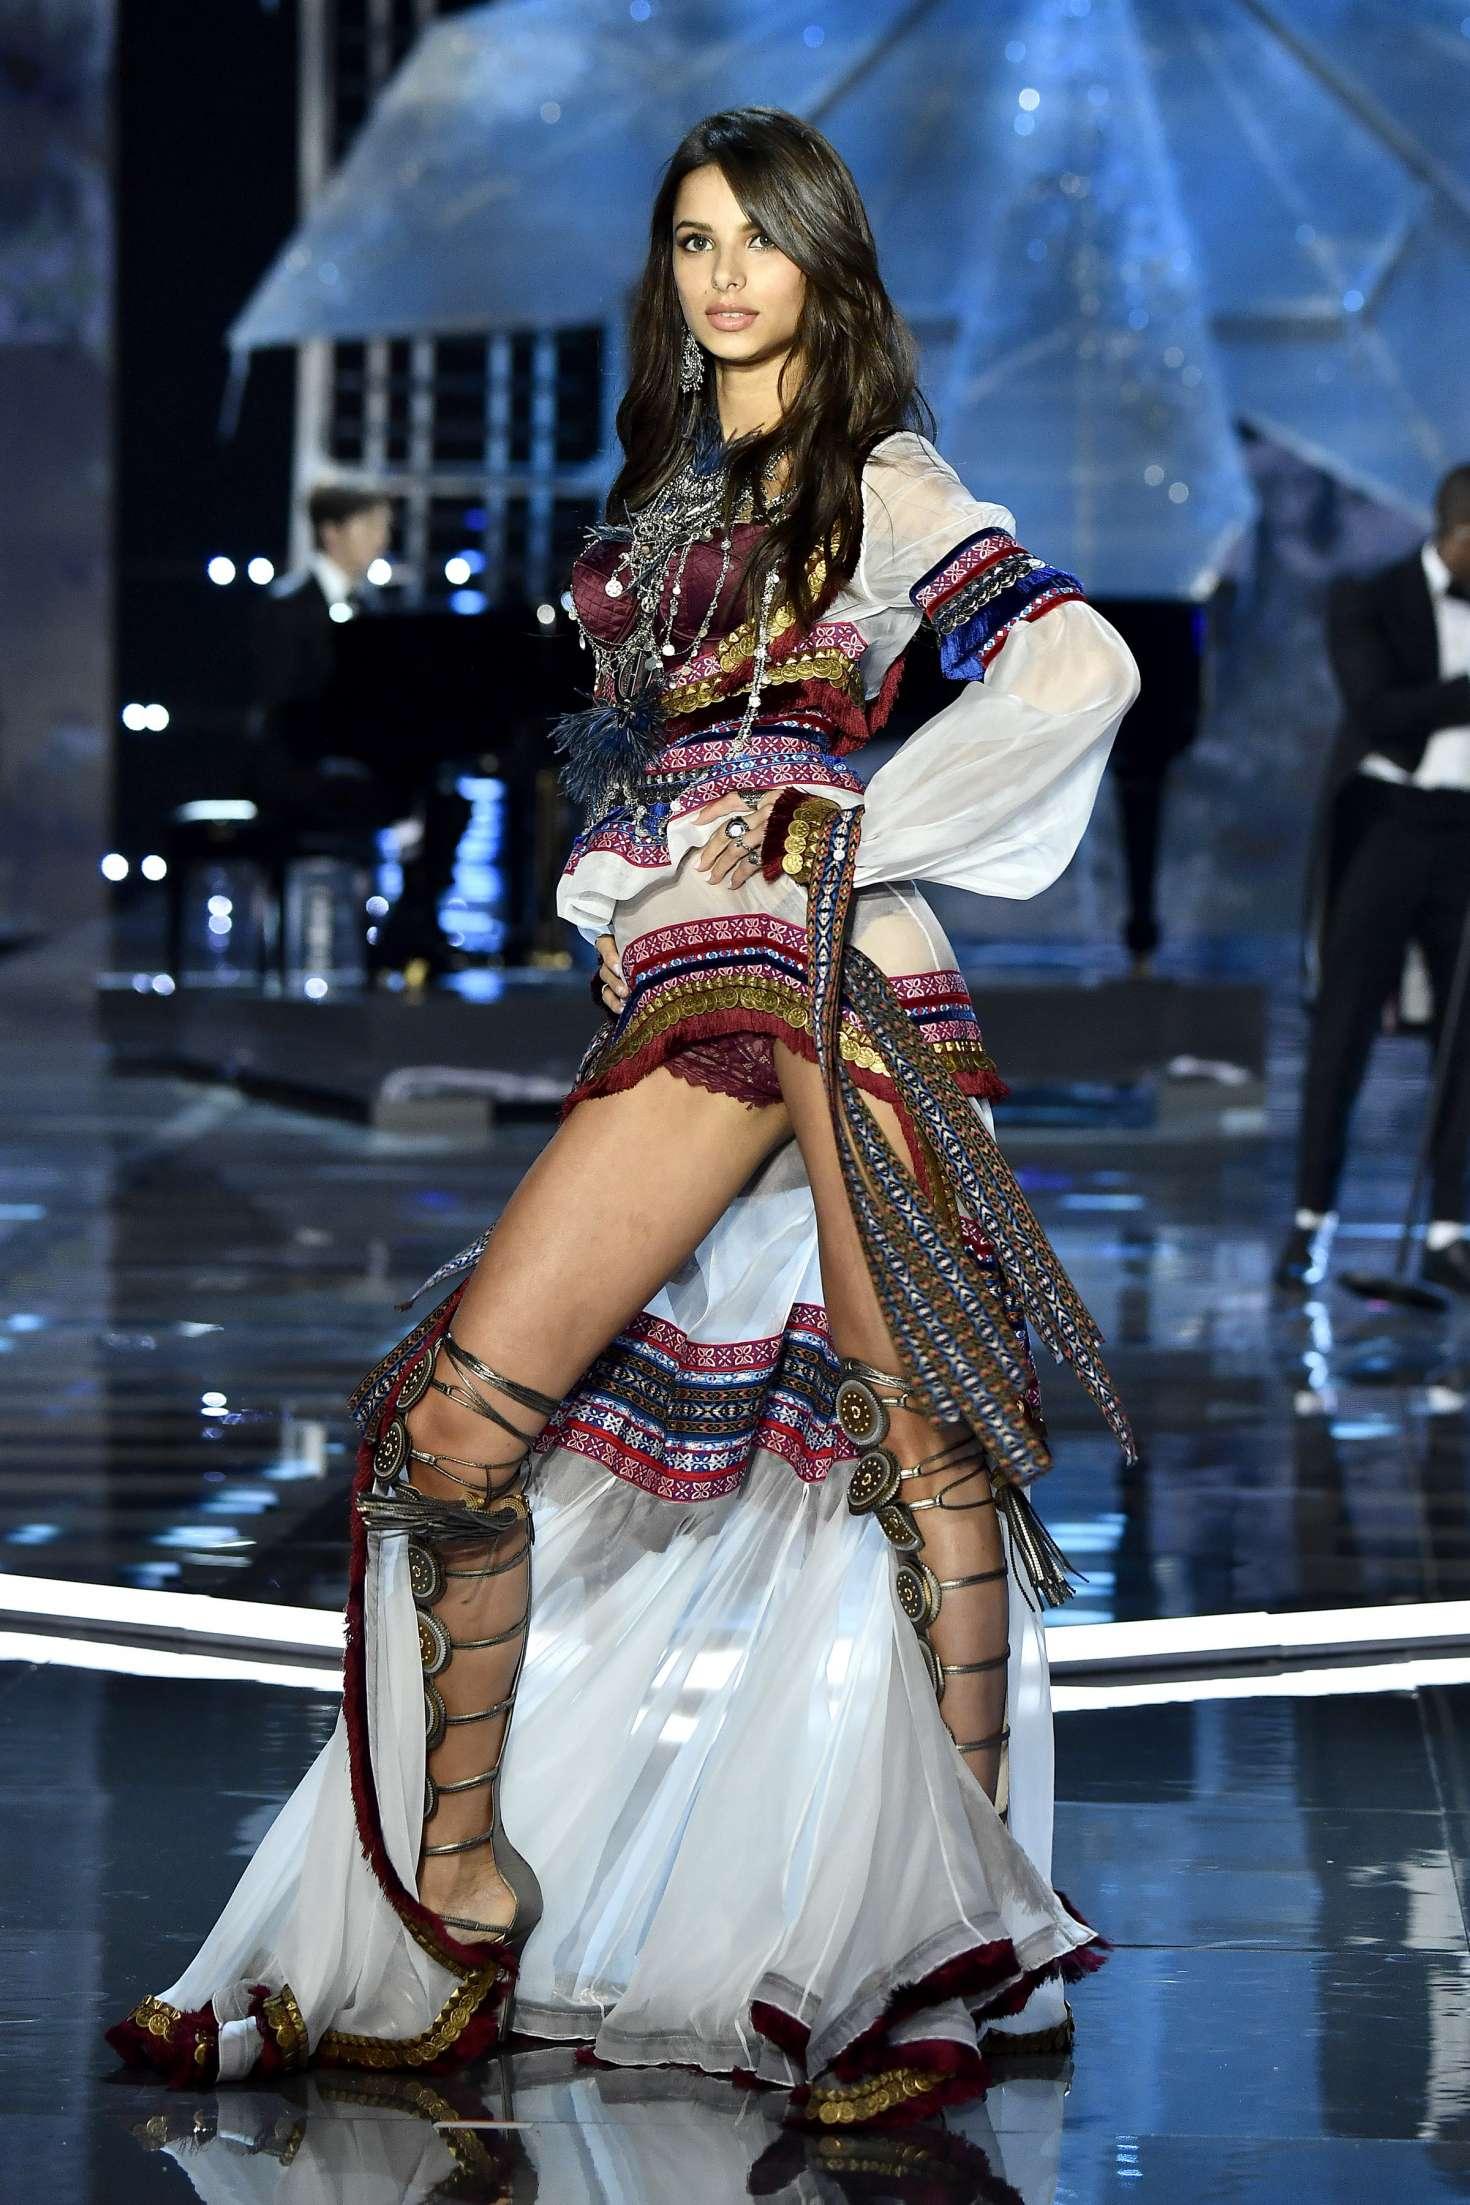 Gizele Oliveira - 2017 Victoria's Secret Fashion Show Runway in Shanghai